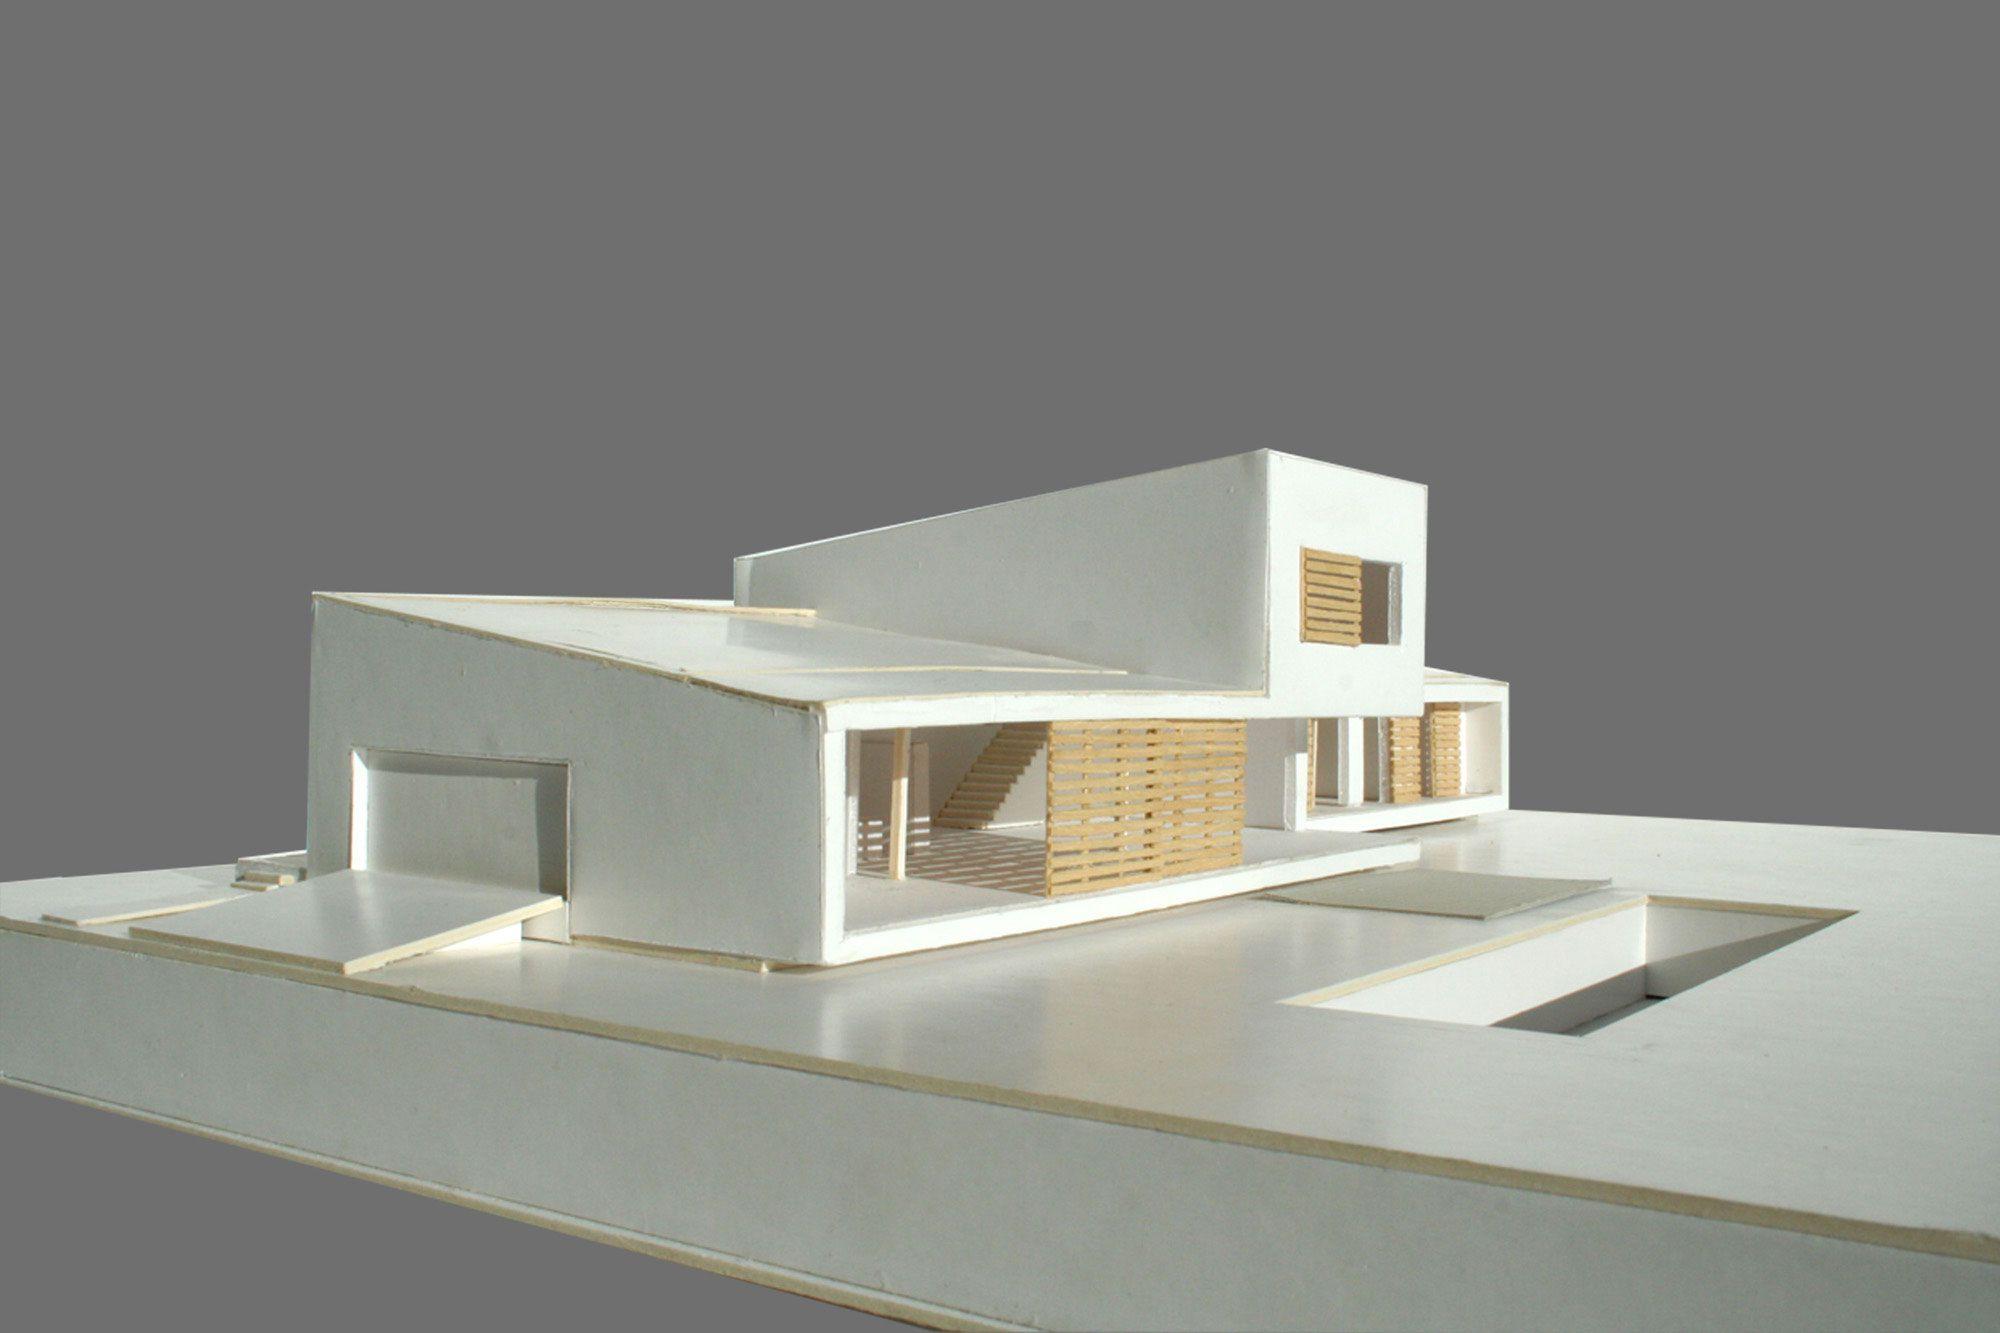 Casa-Bauzà-22